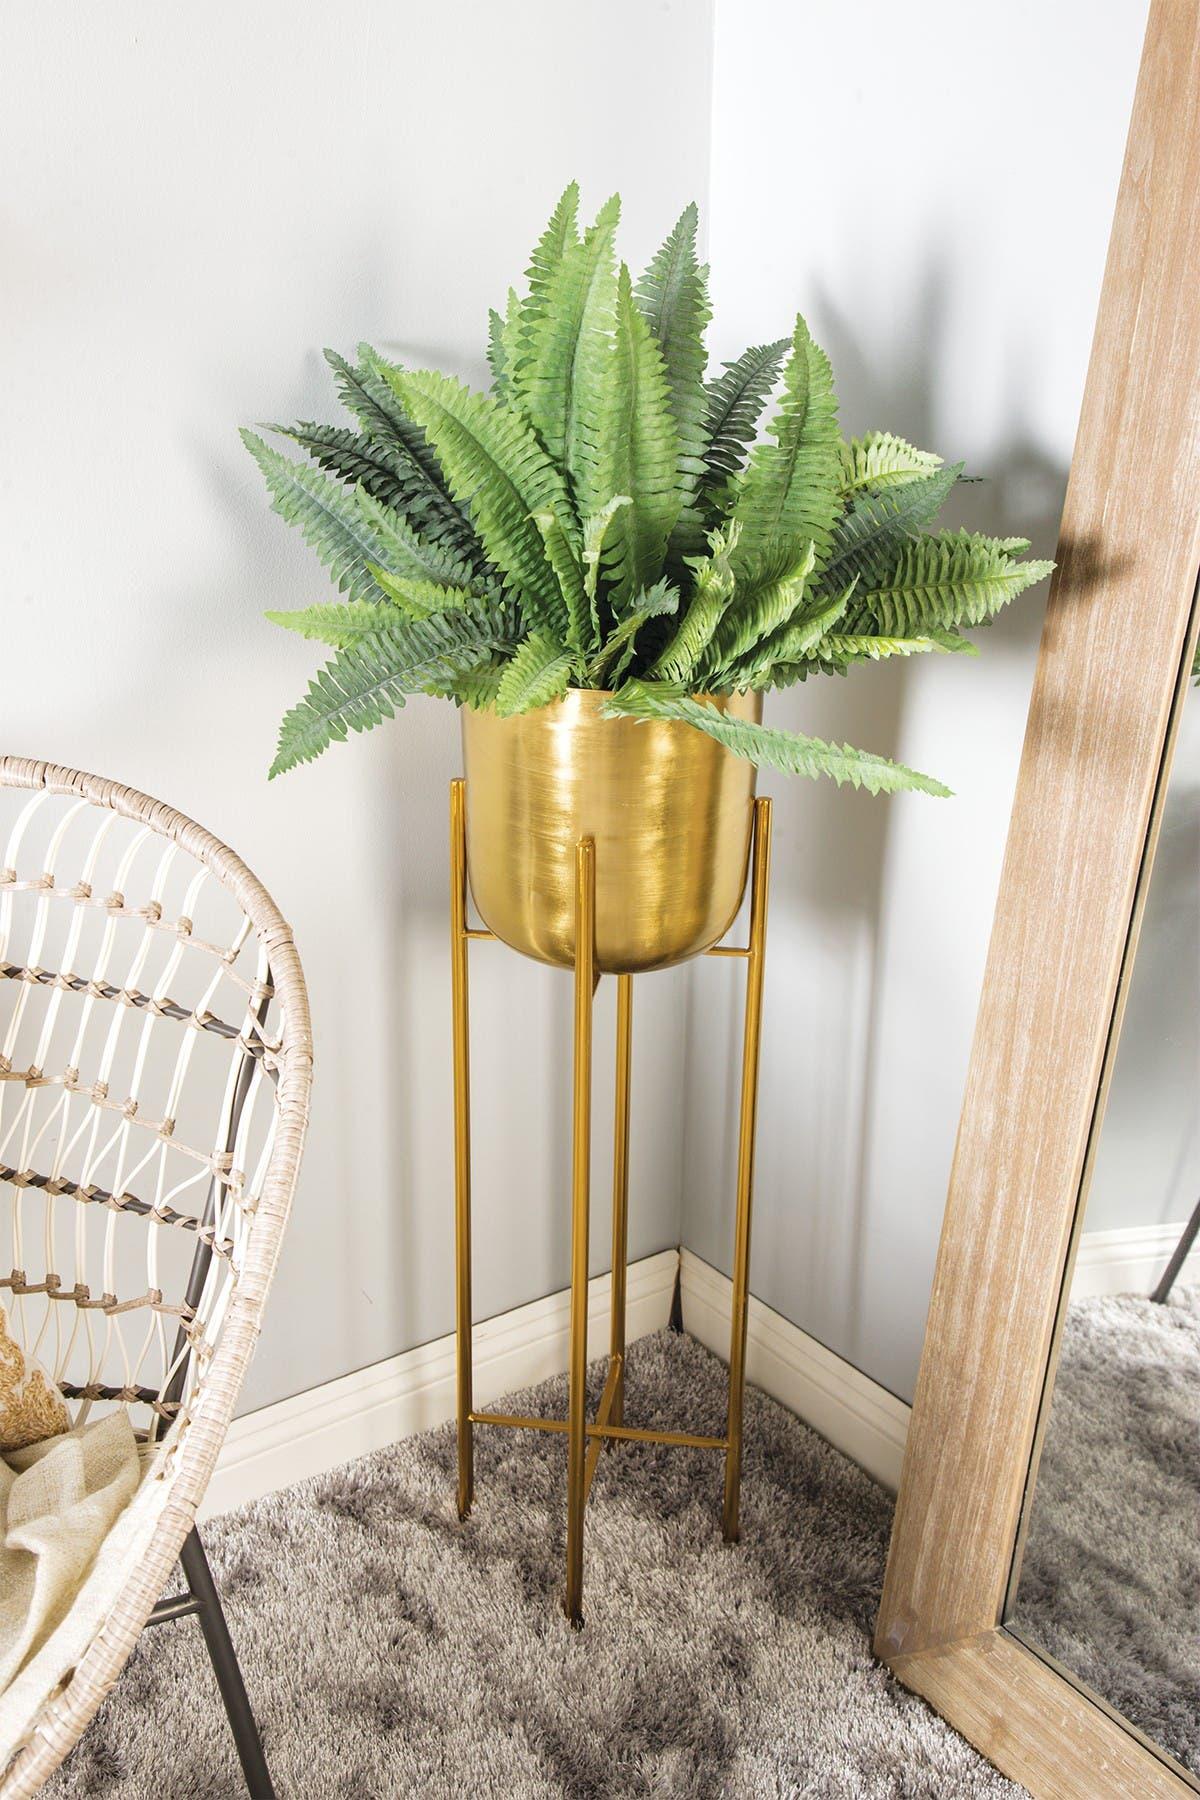 Image of COSMO BY COSMOPOLITAN Gold Metal Floor Planter - Set of 2